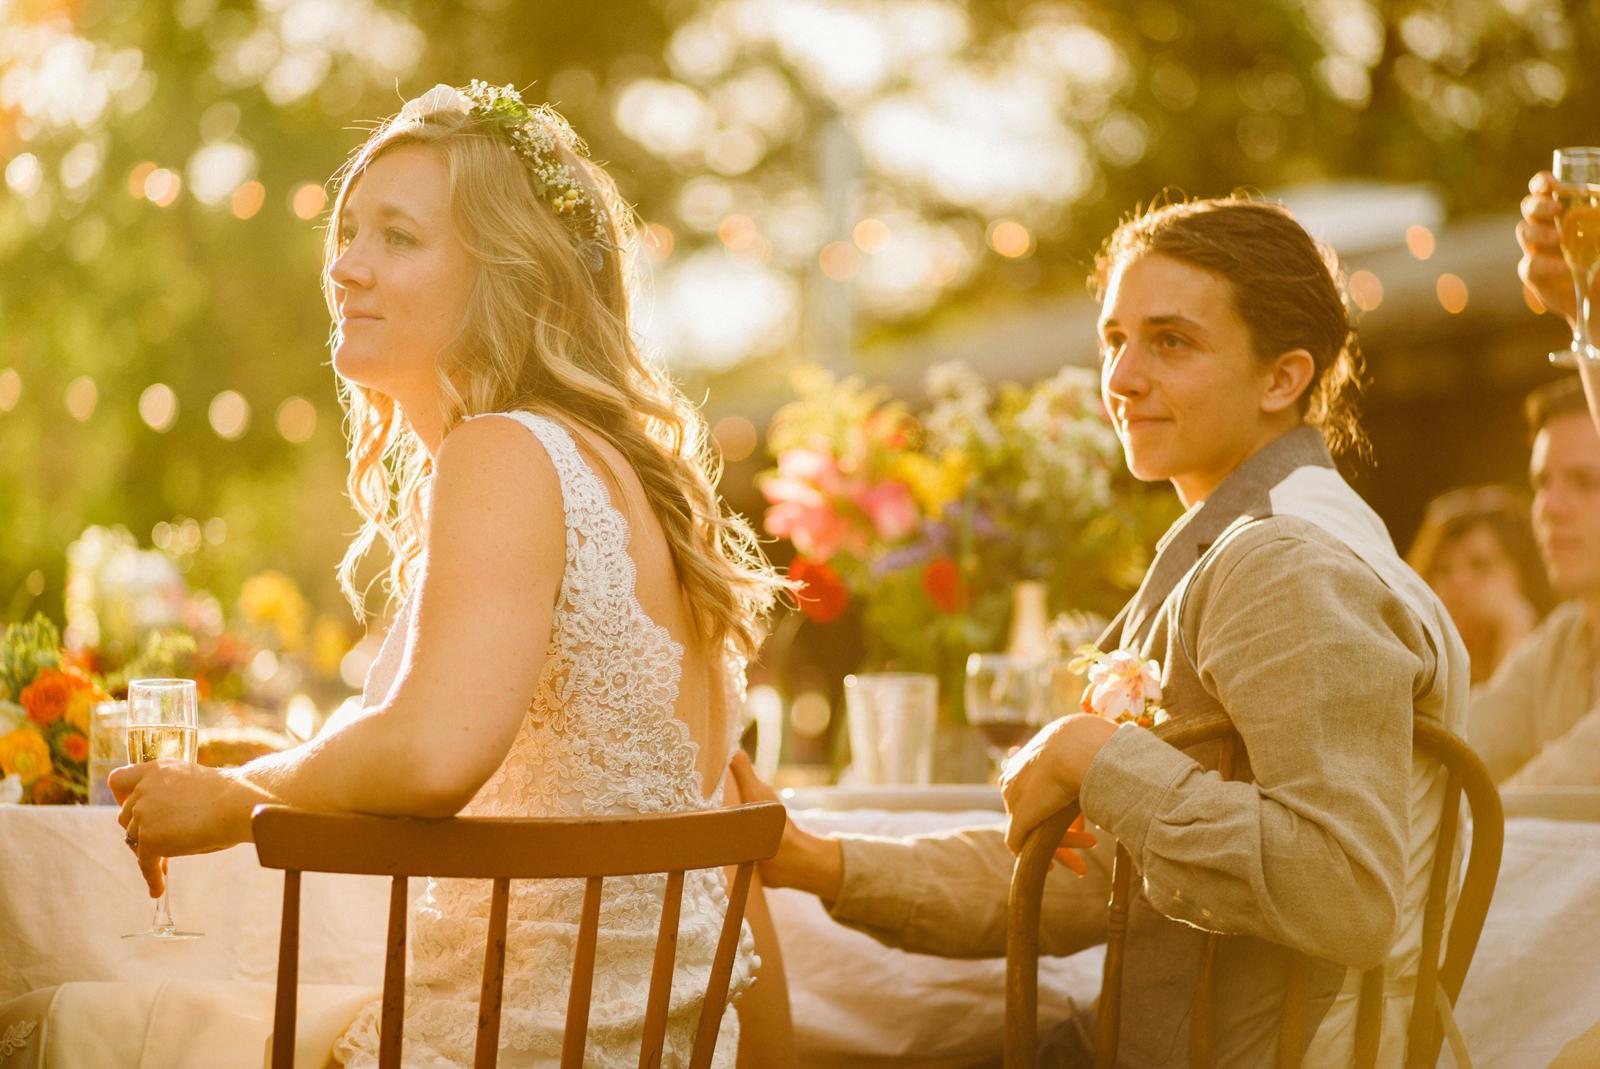 rivers-bend-retreat-wedding-079 RIVER'S BEND RETREAT WEDDING